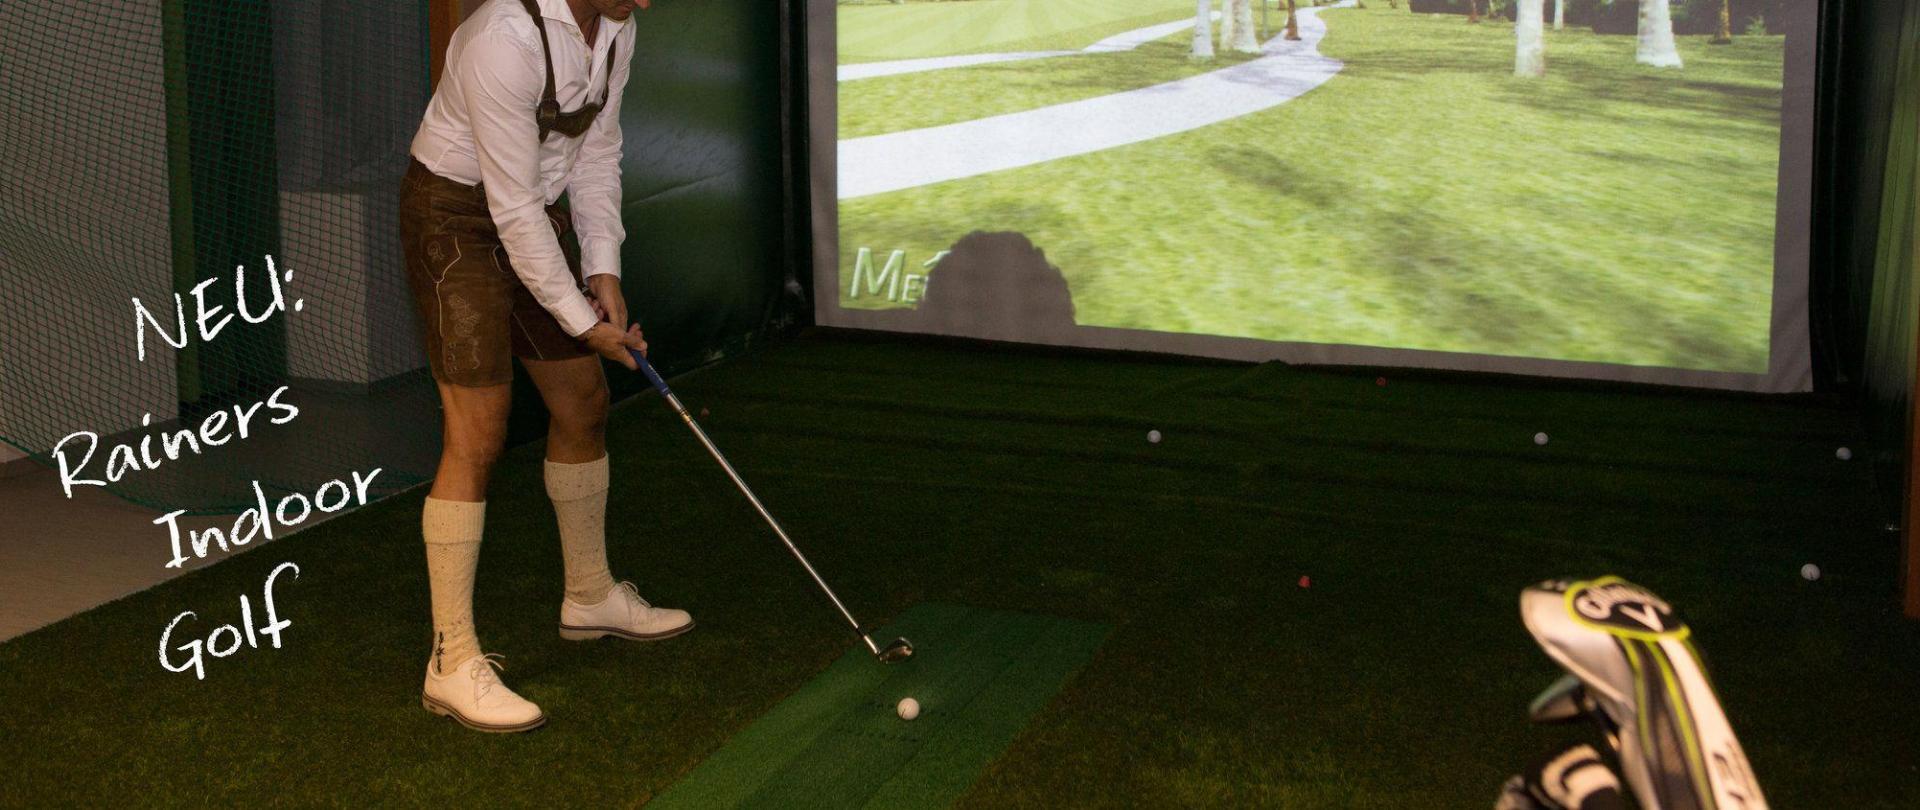 golf_bild-4.jpg